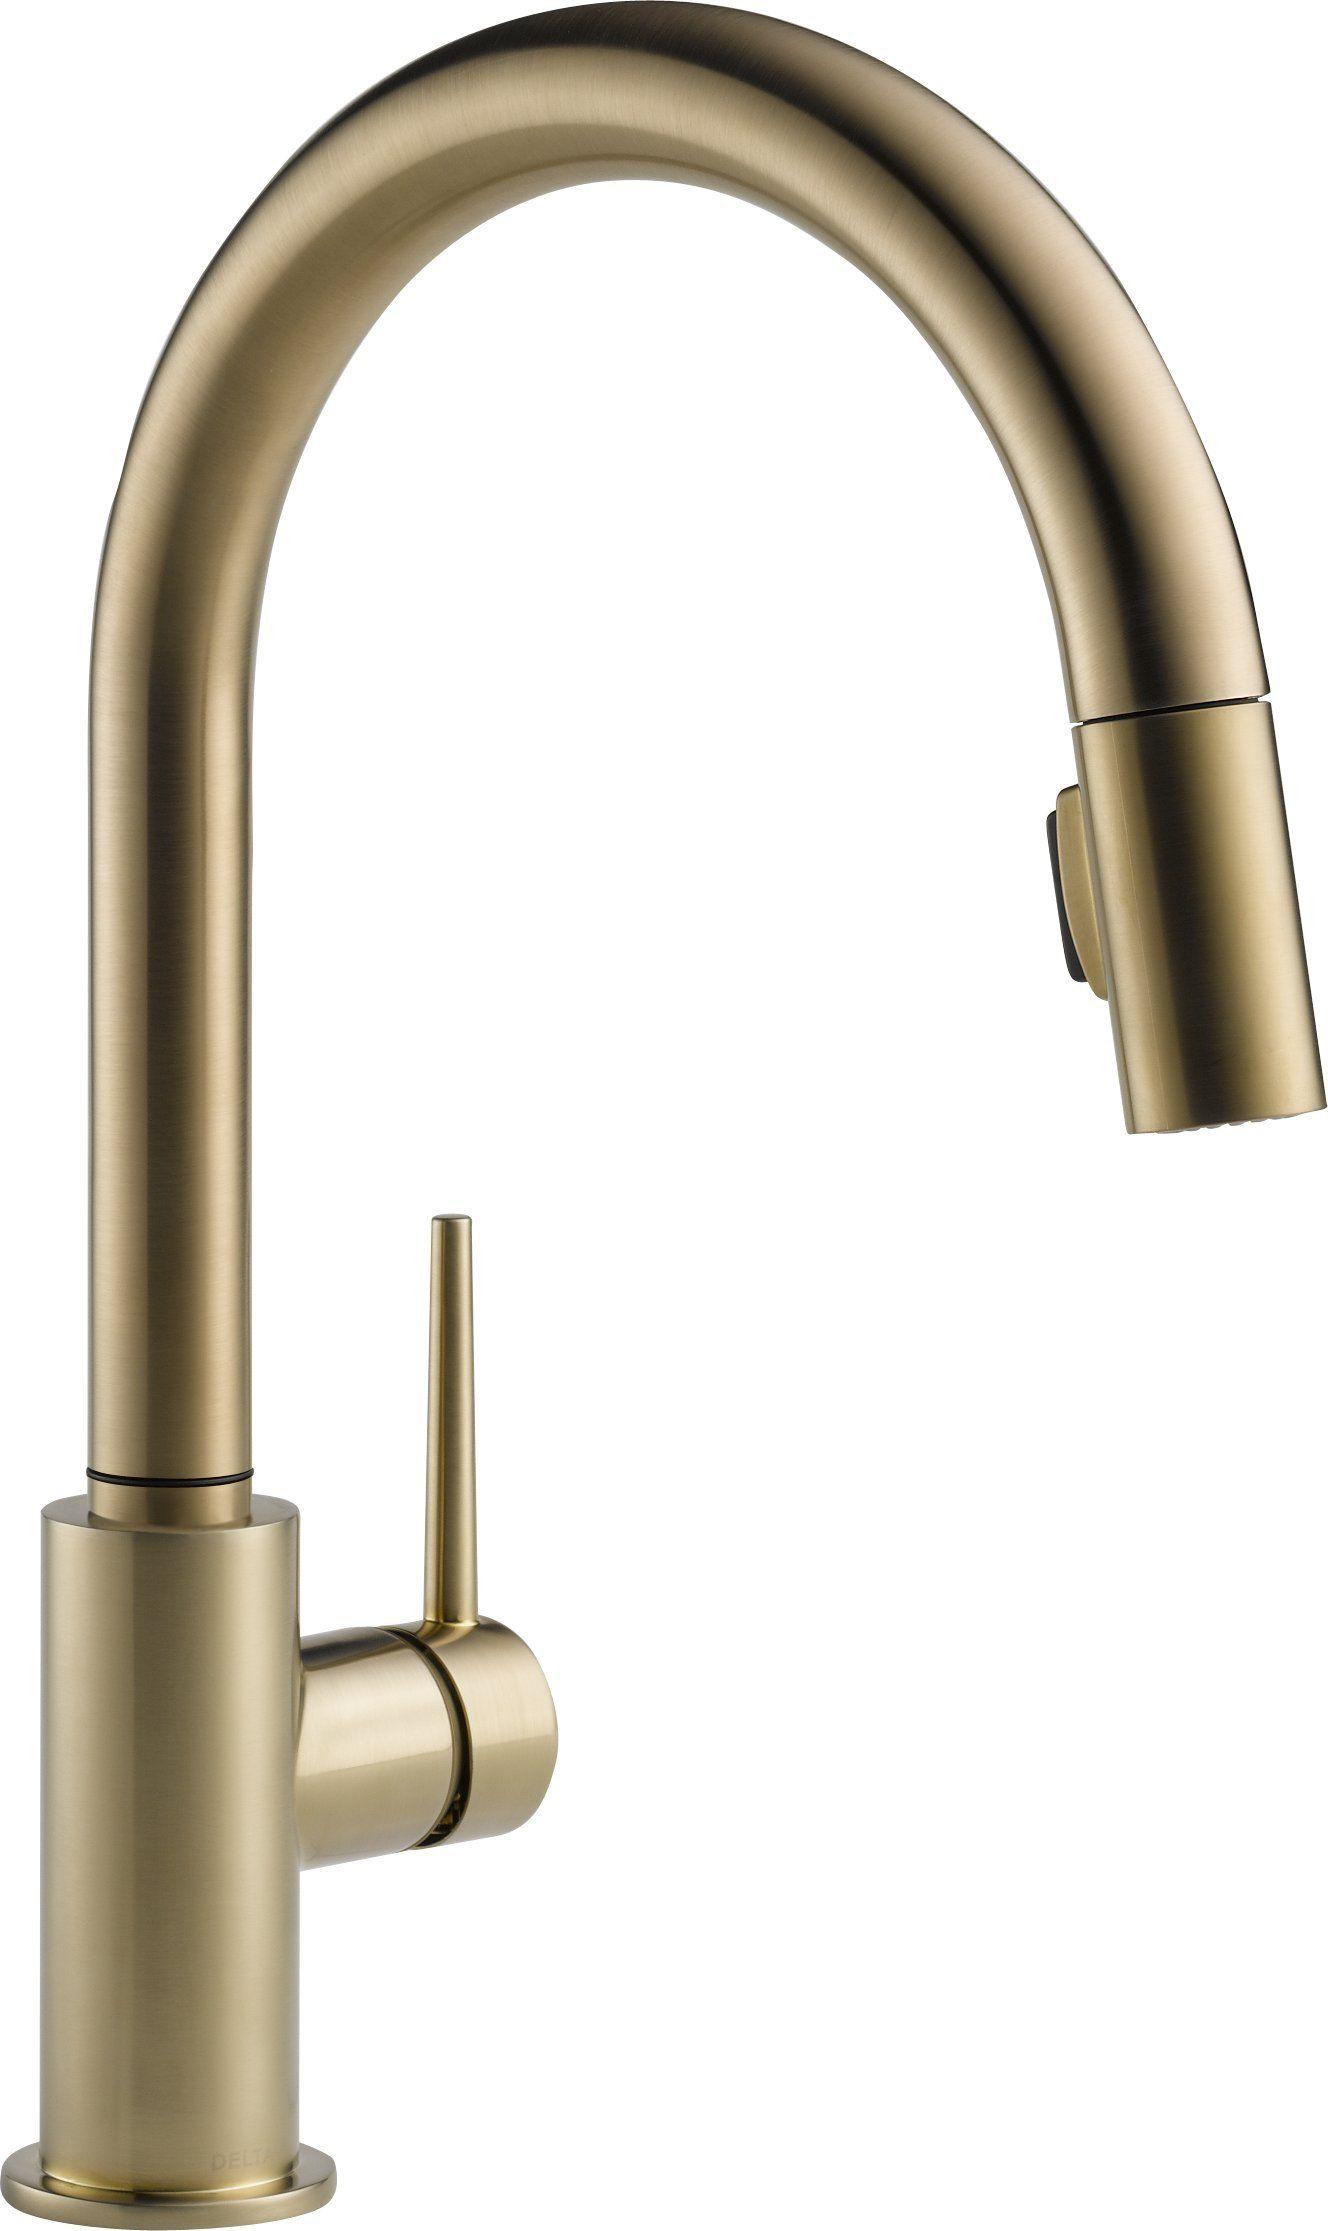 Delta 9159-CZ-DST Single Handle Pull-Down Kitchen Faucet, Champagne ...